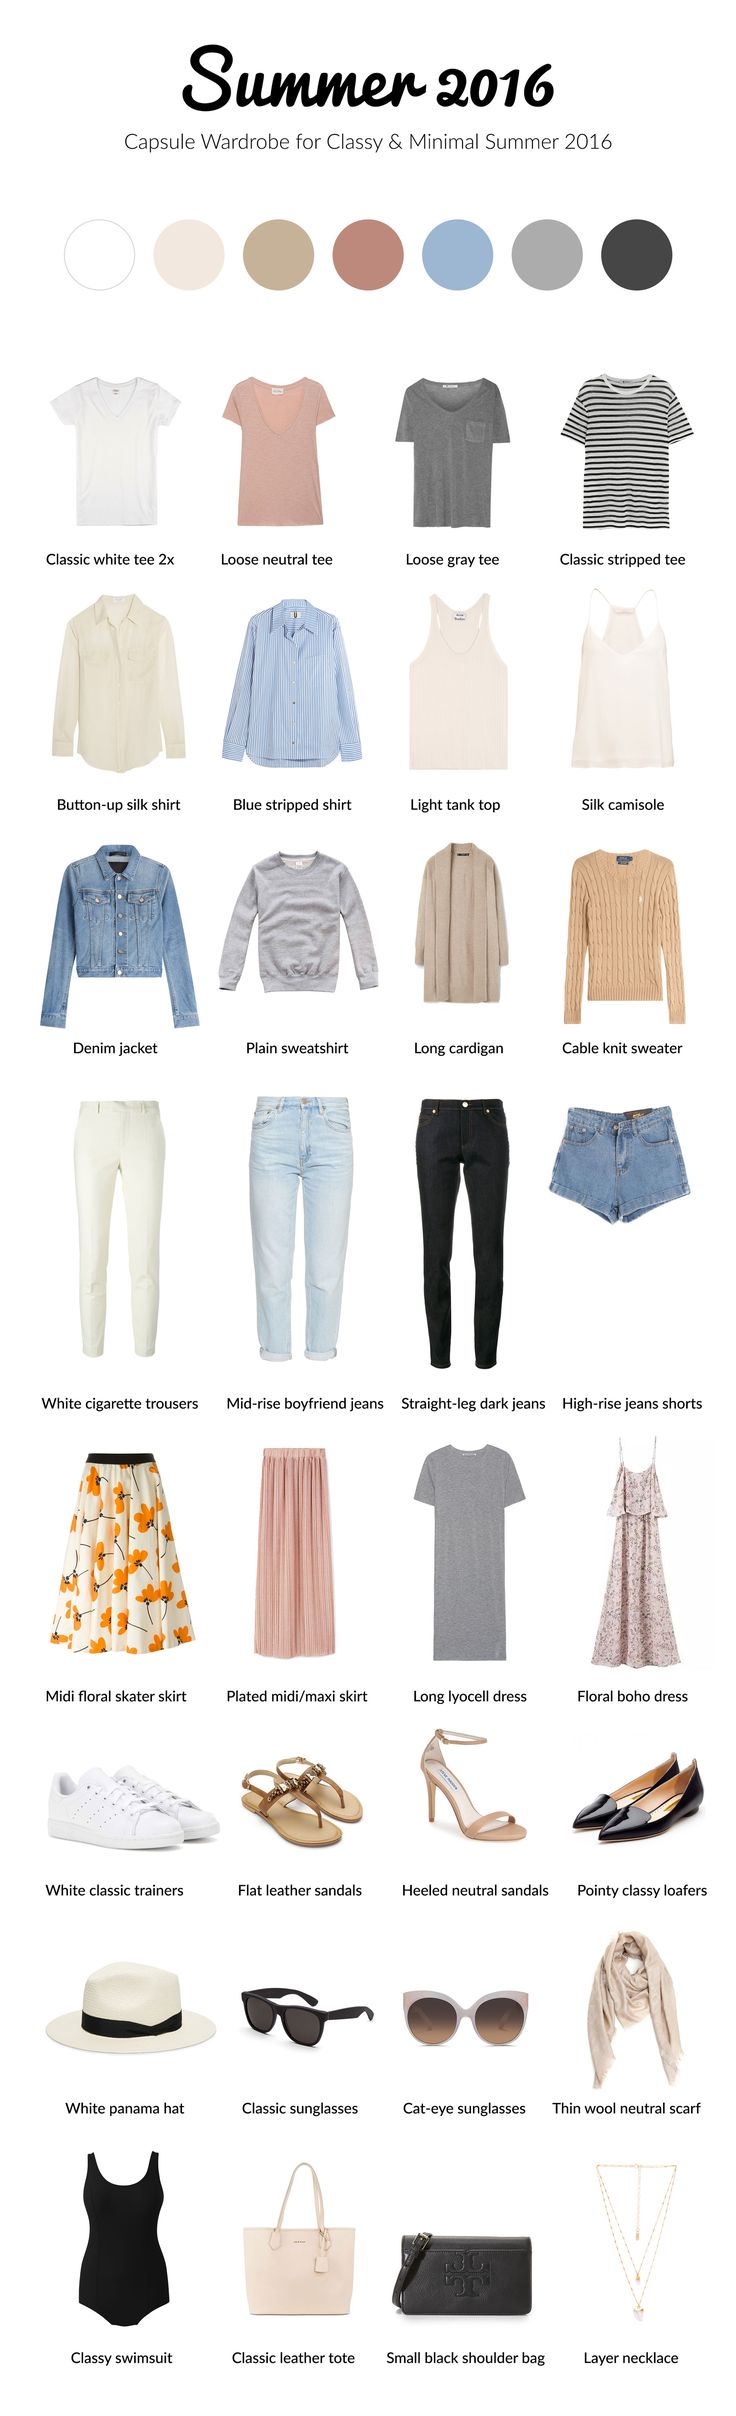 Summer 2016 capsule wardrobe for classy and #minimal #capsule by @brigitadaisy